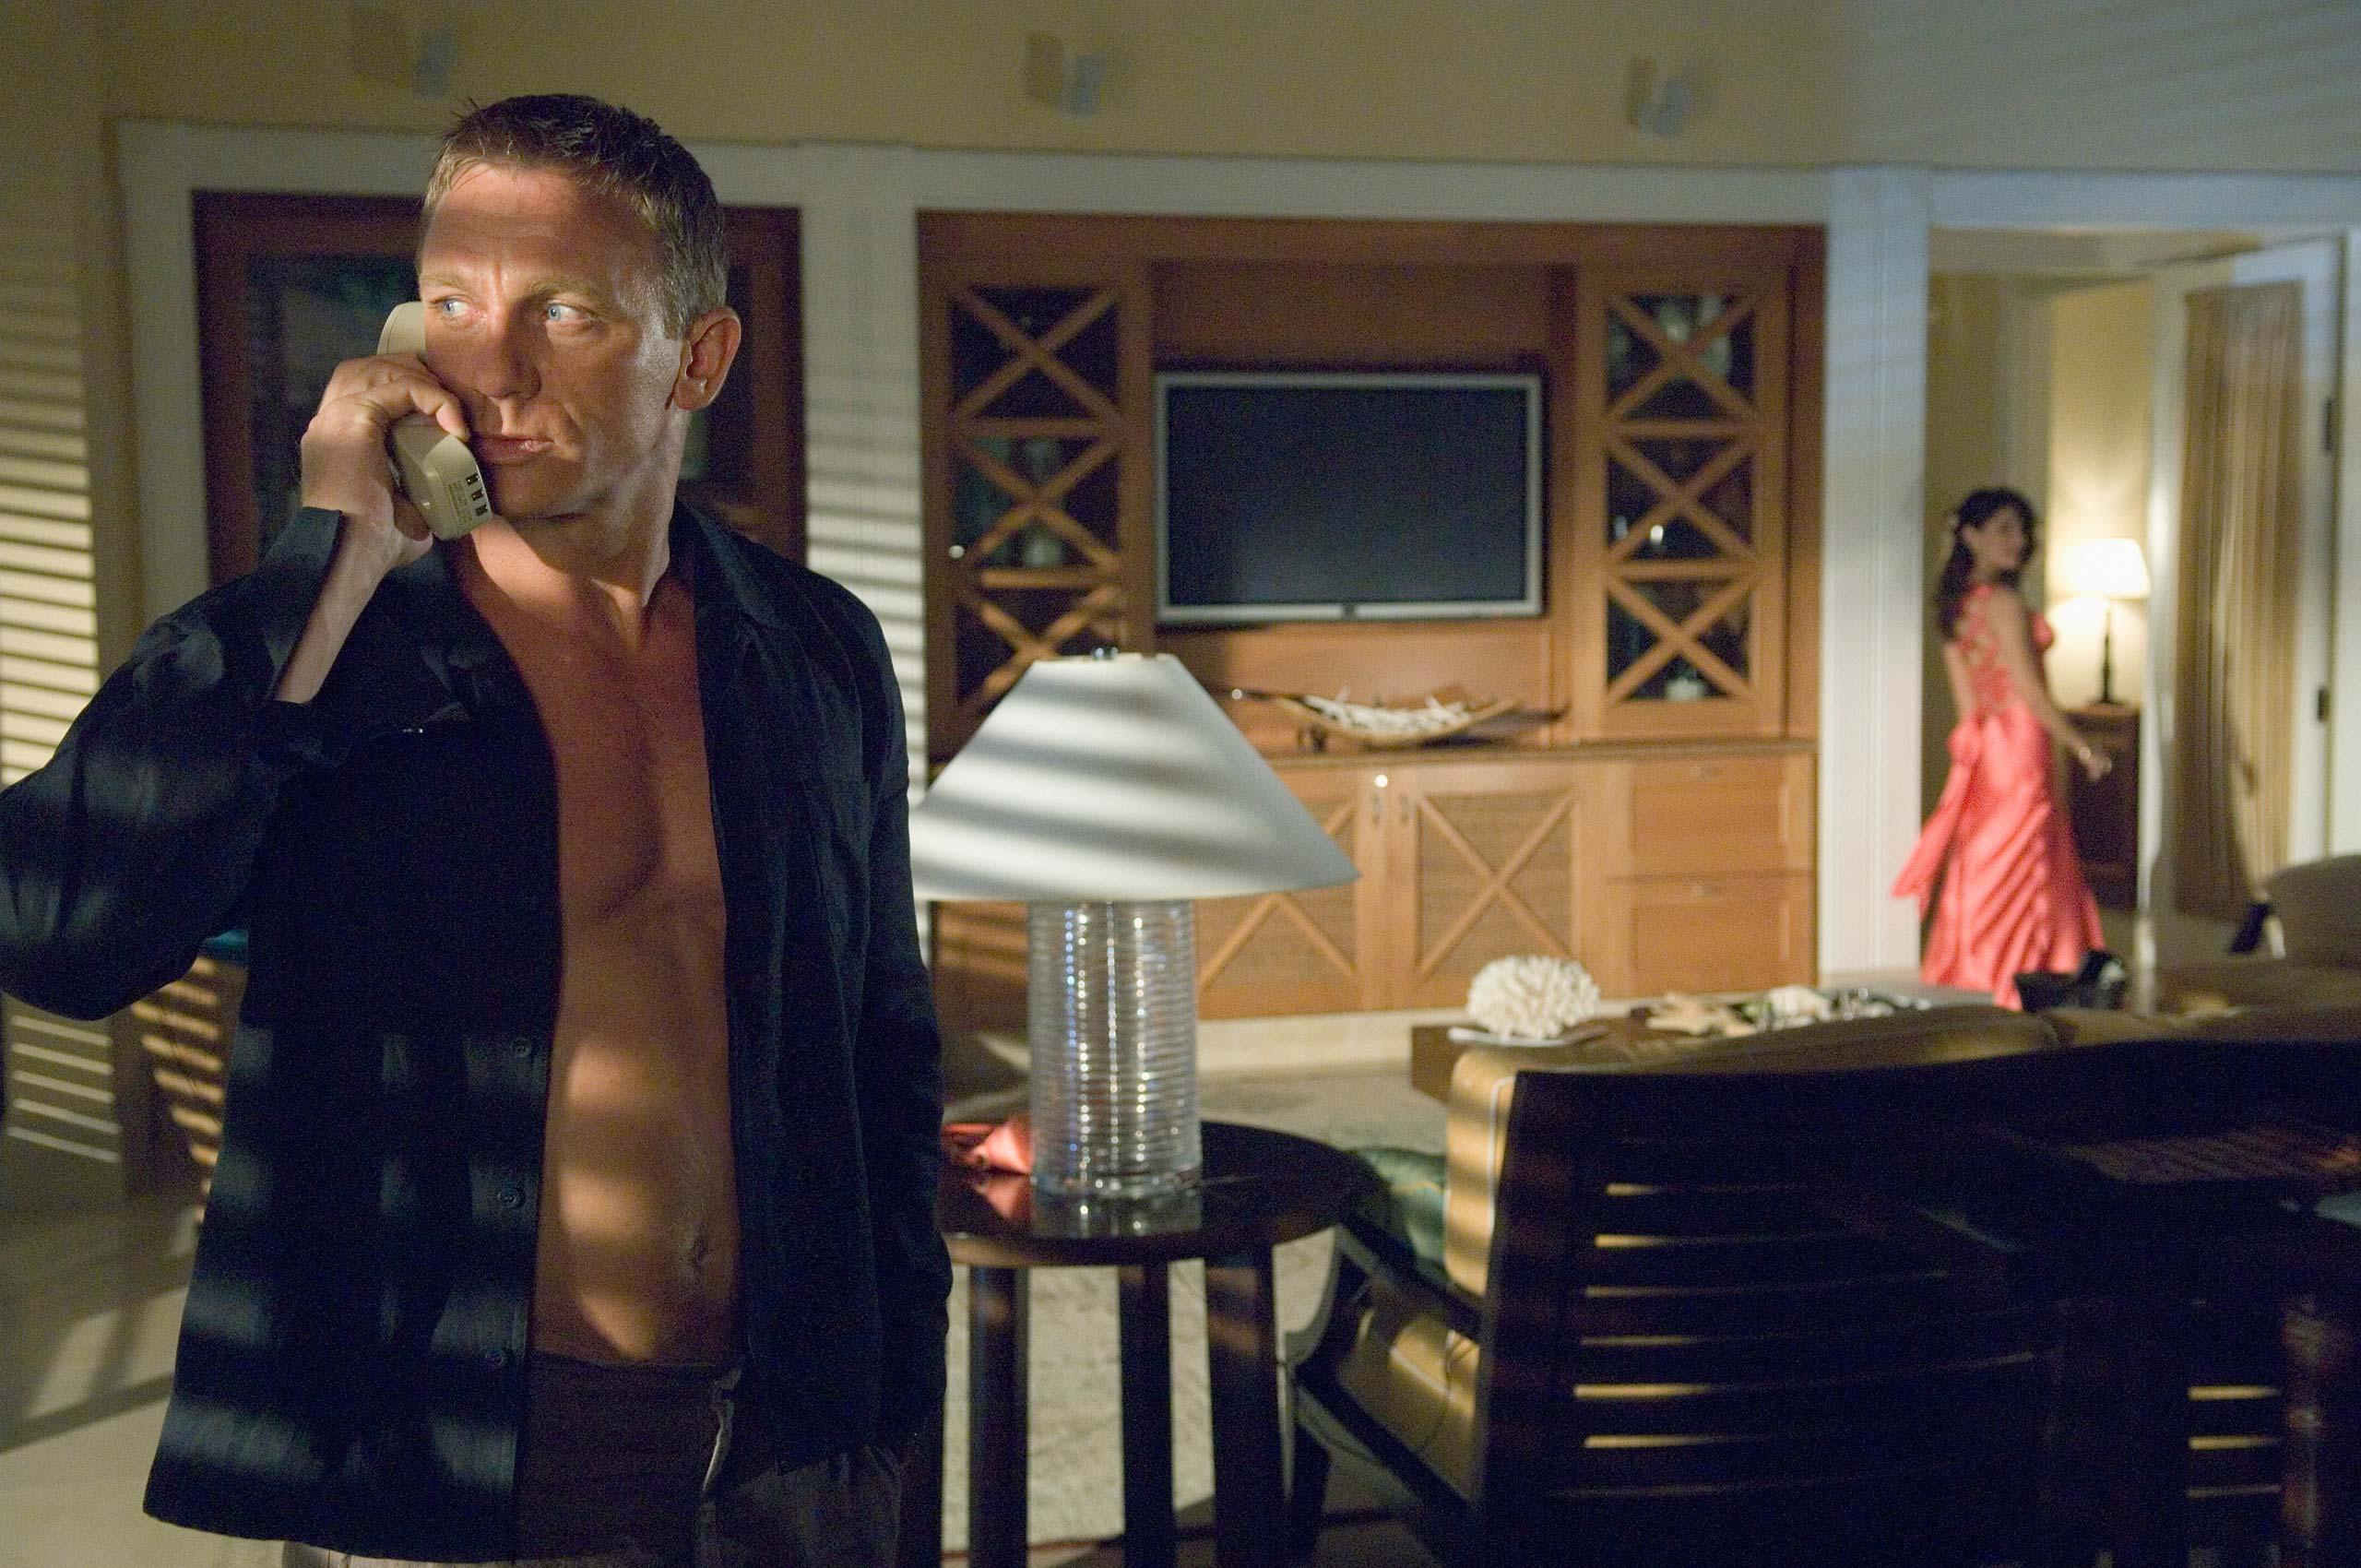 <strong><i>Casino Royale</i> (2006) - Daniel Craig</strong>